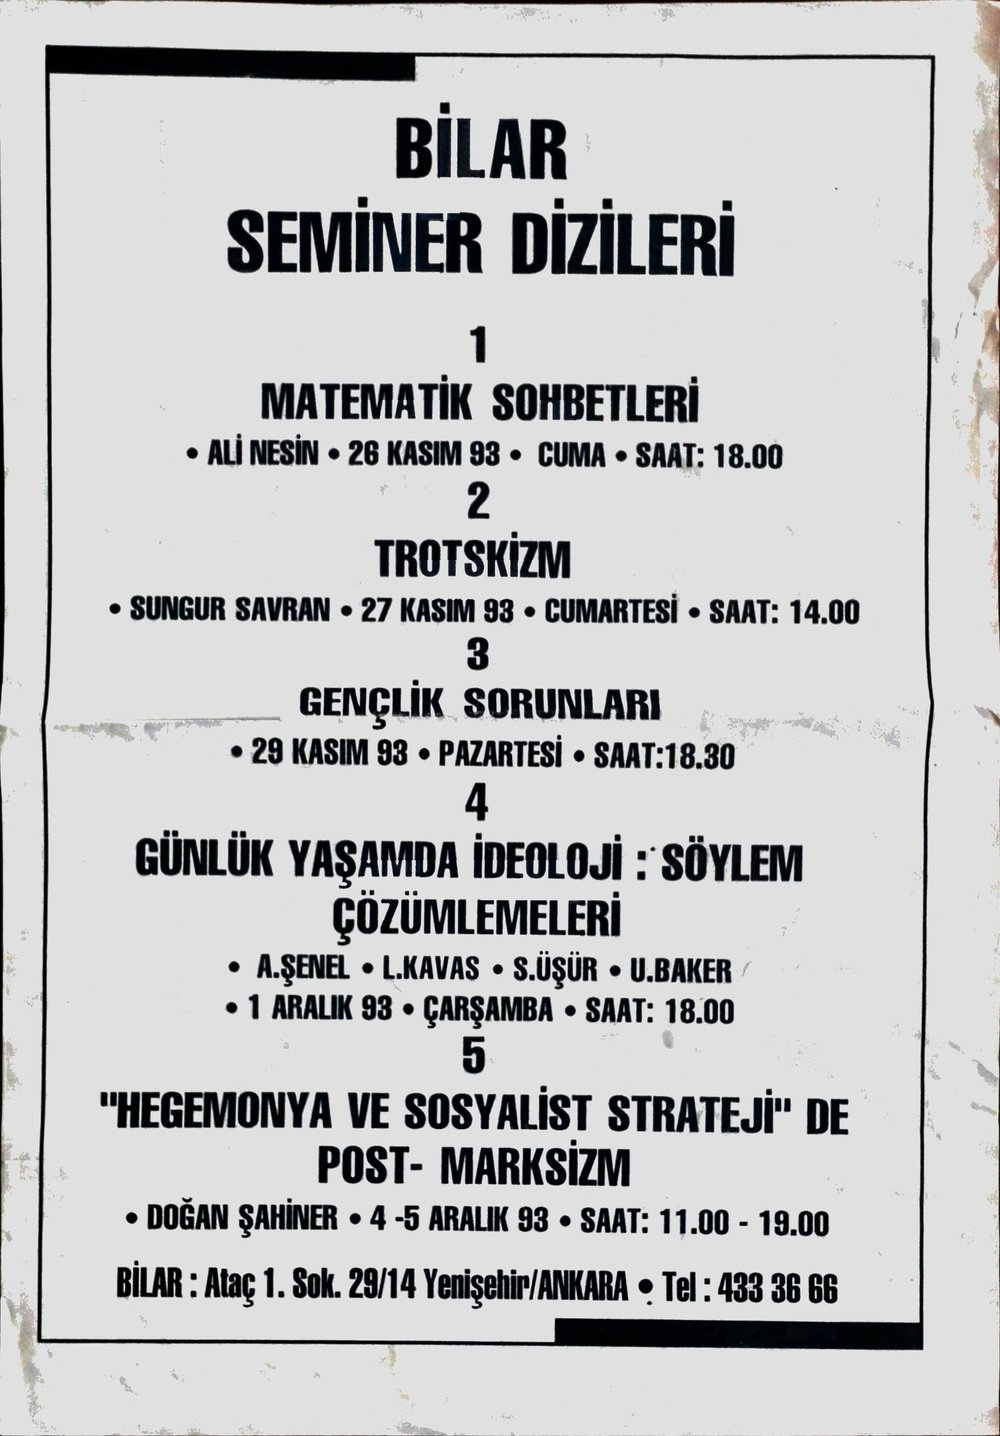 afis-1993-11-seminer dizisi duyrusu-halukgergerarsivi.jpg